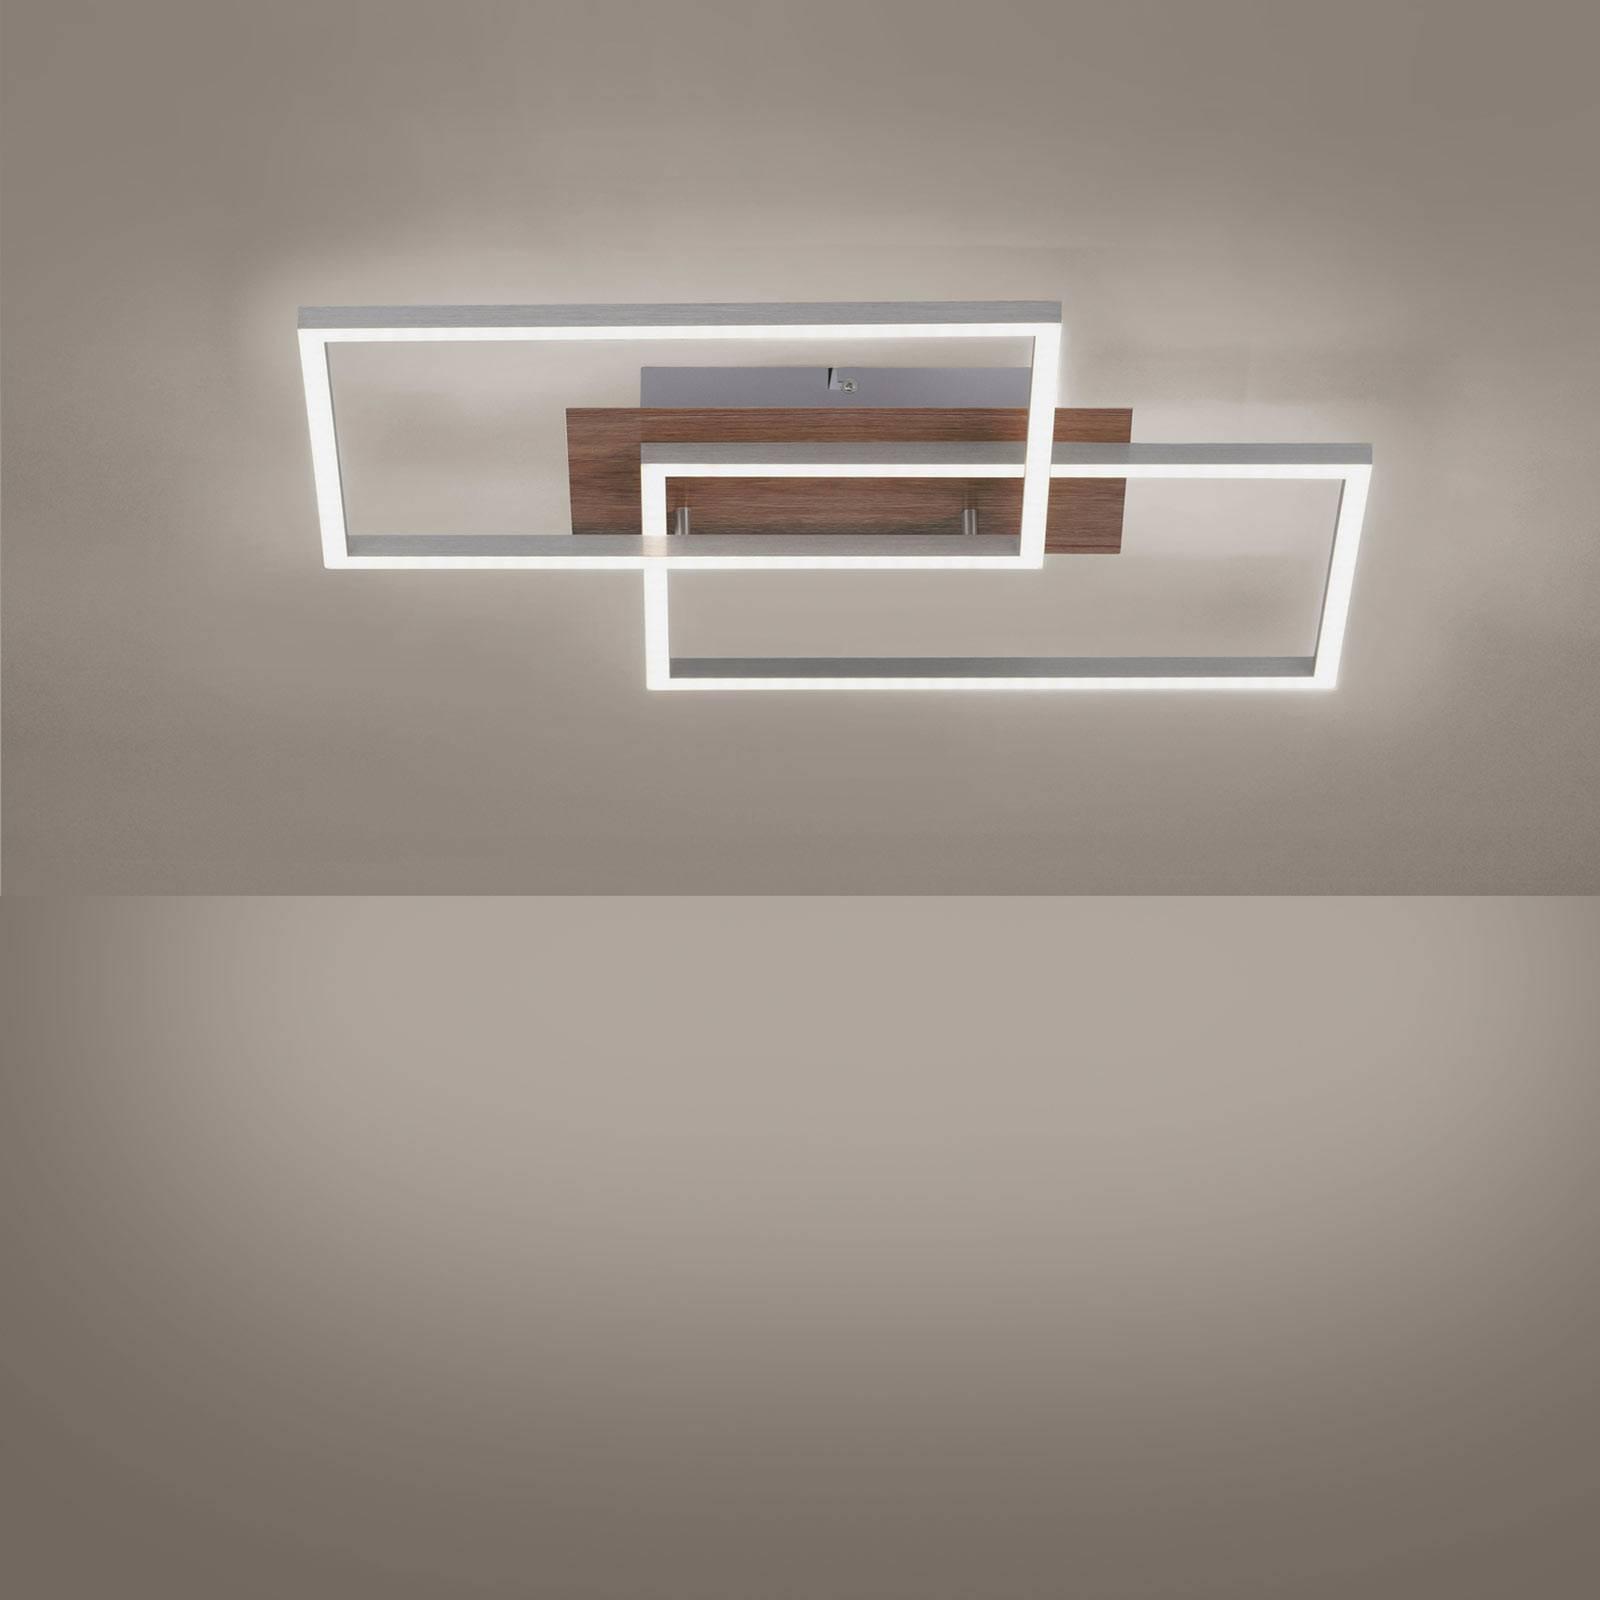 LED-Deckenleuchte Iven Holzdekor/stahl 2Fl Quadrat